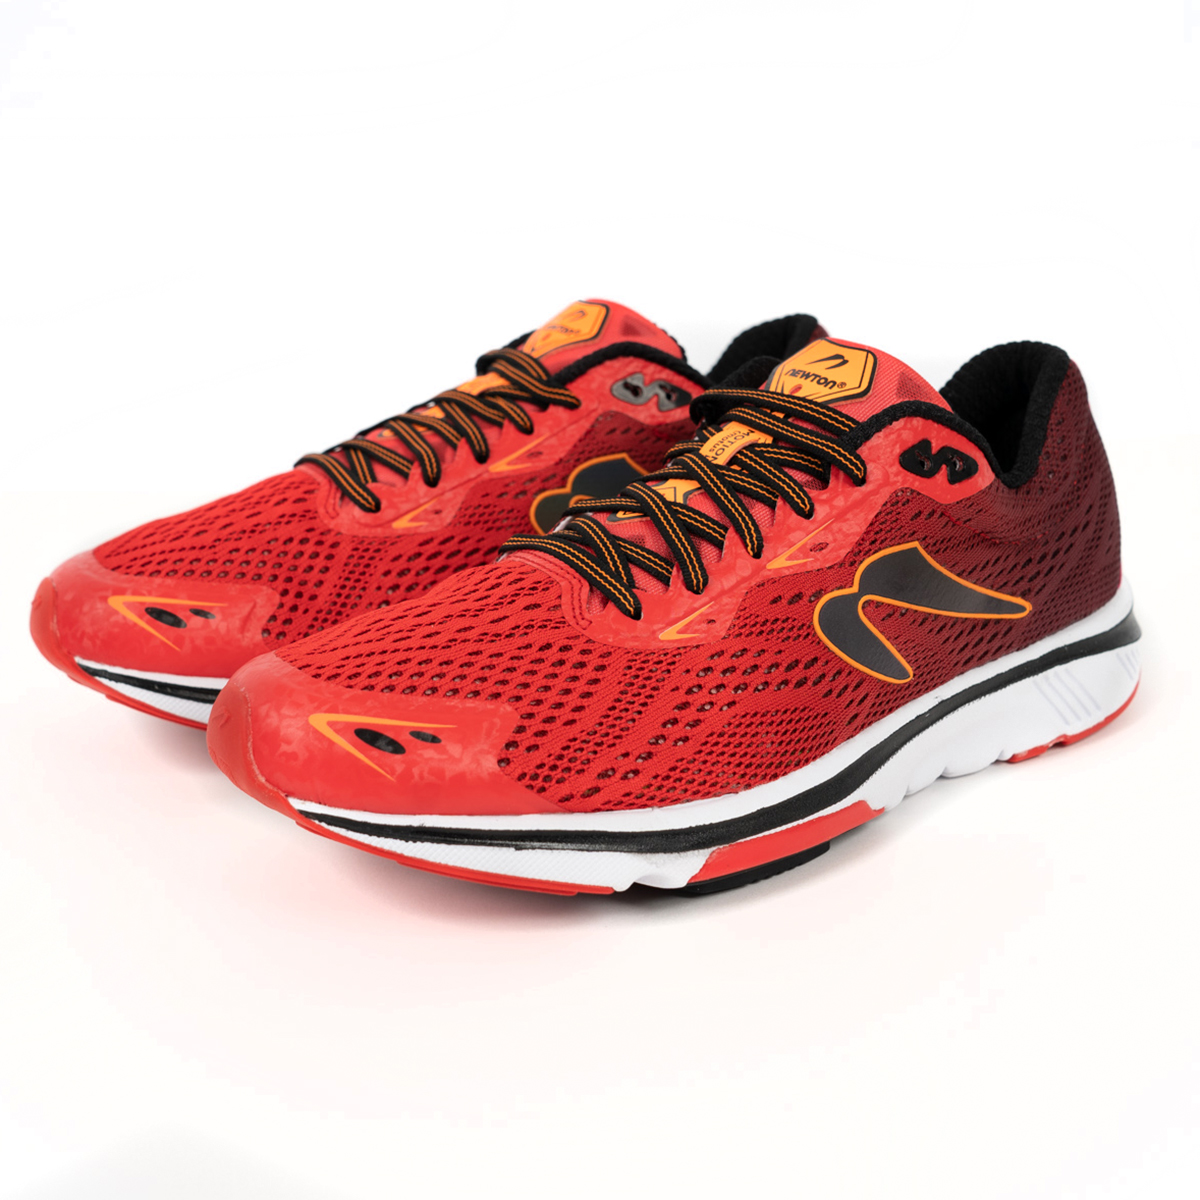 Men's Newton Motion 9 Running Shoe - Color: Brick/Orange (Regular Width) - Size: 6, Brick/Orange, large, image 3